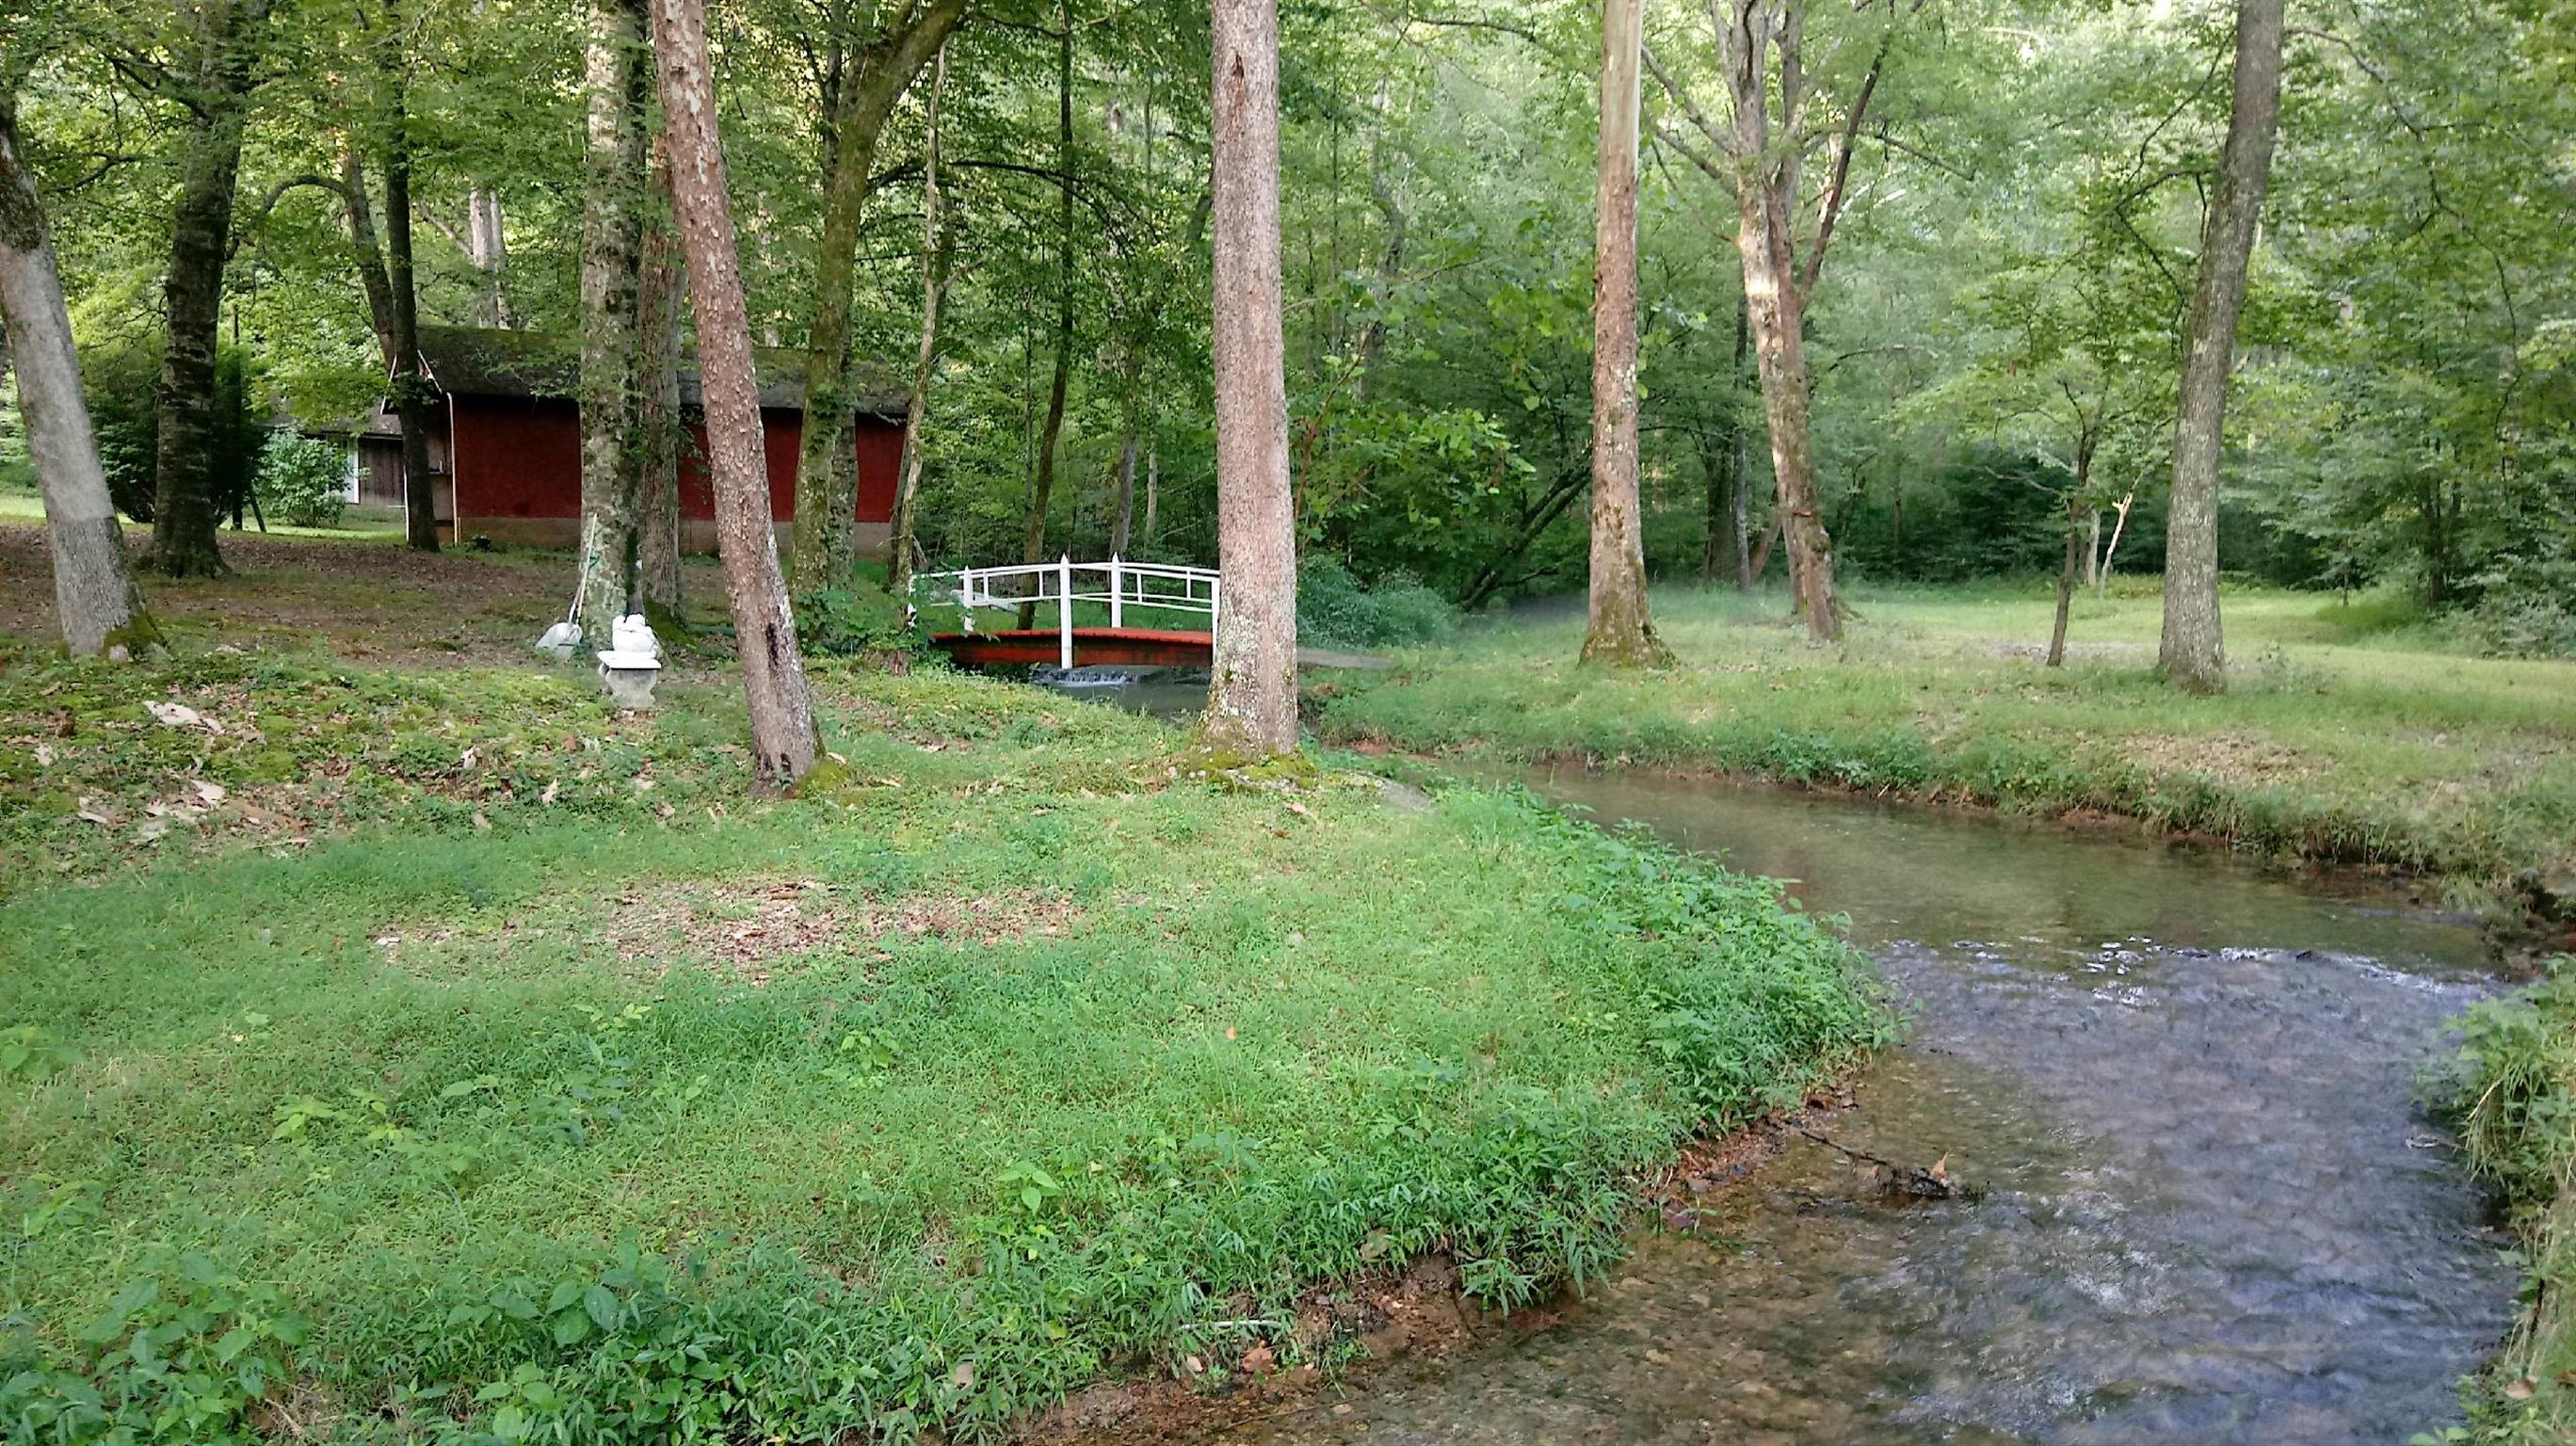 100 Cemetery Rd, N, Lawrenceburg, TN 38464 - Lawrenceburg, TN real estate listing